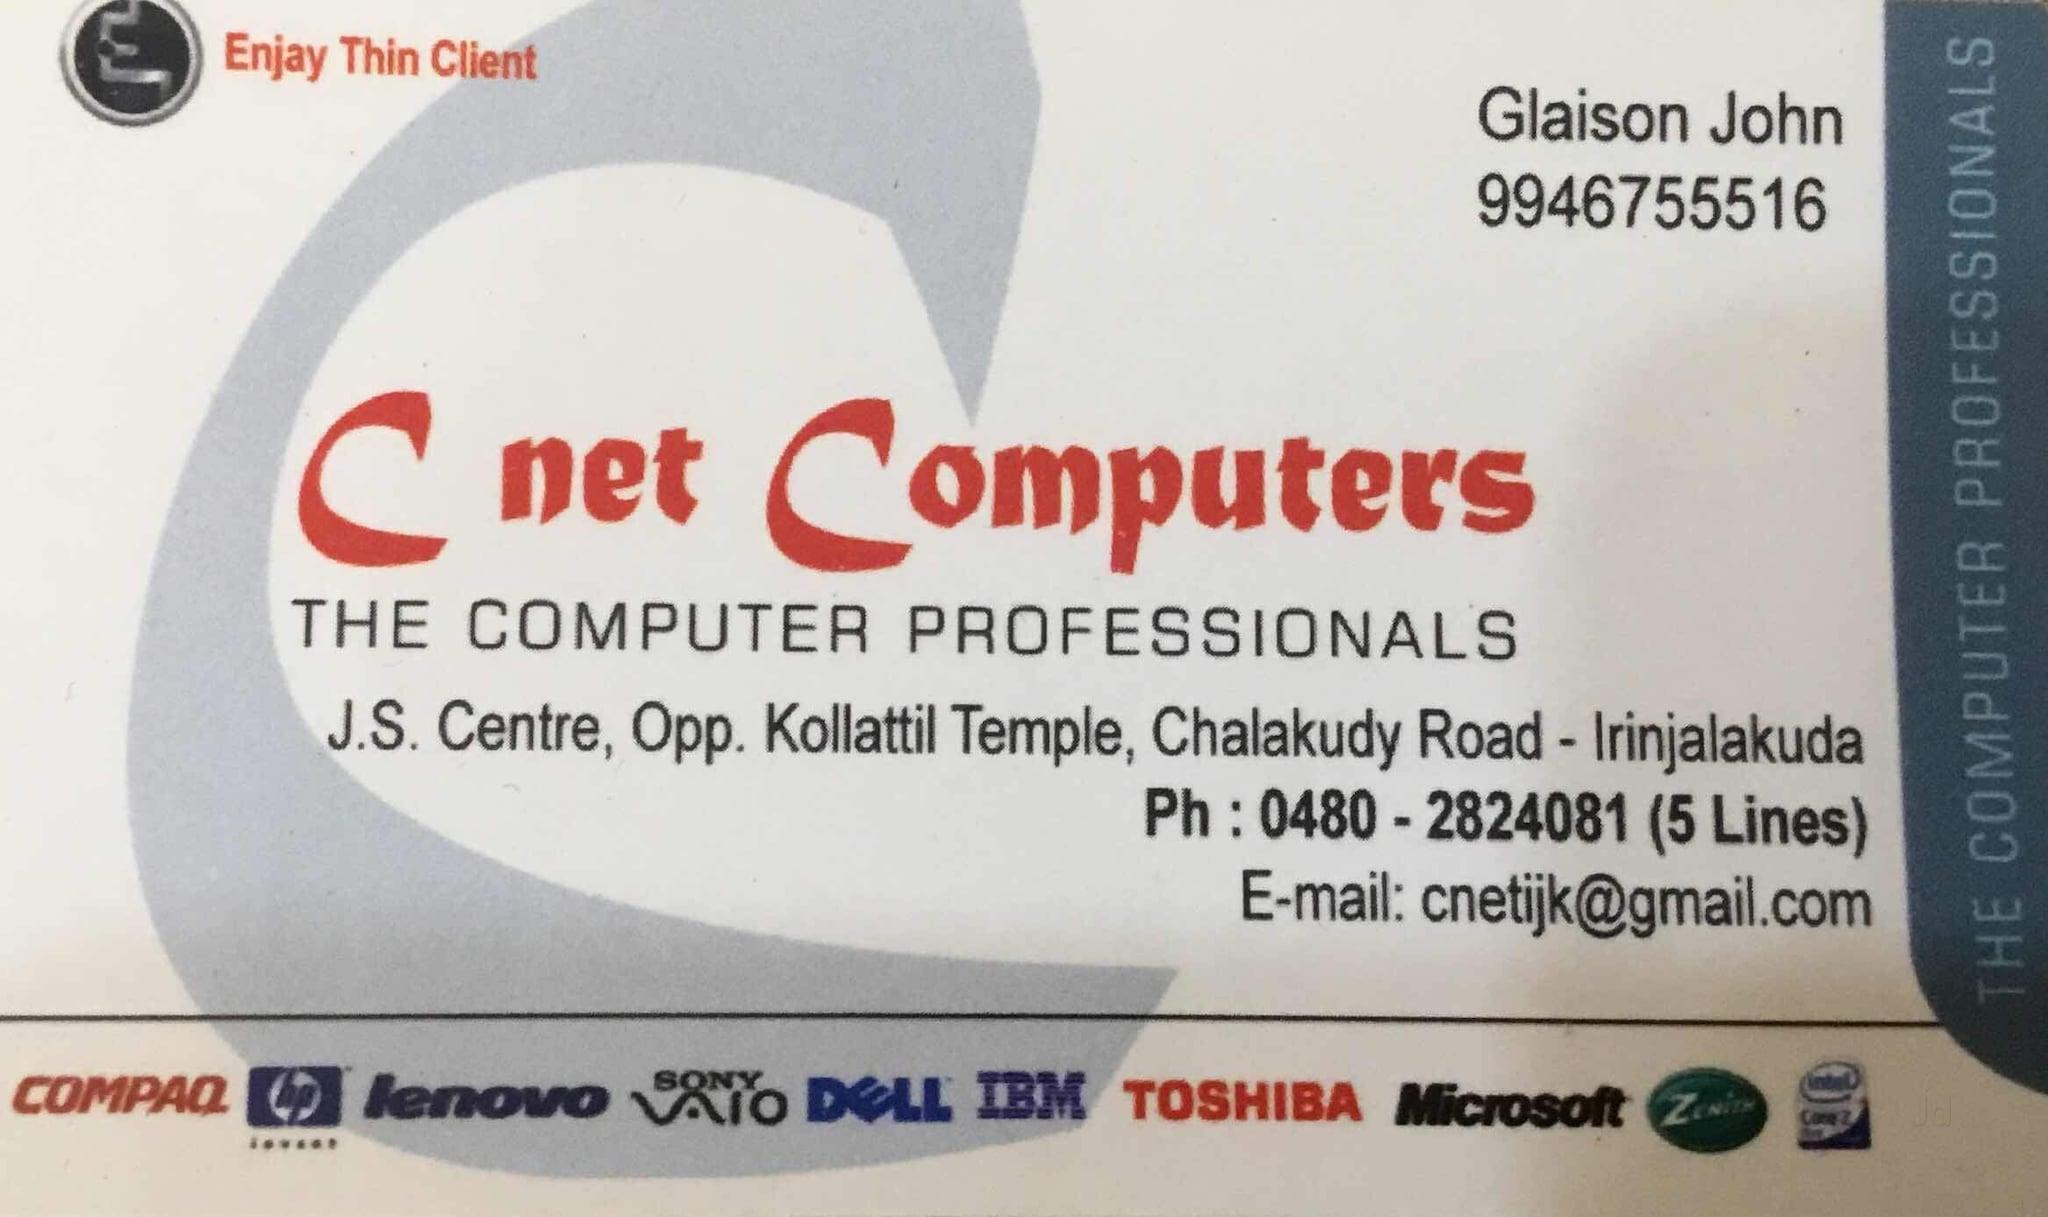 Top Lenovo Laptop Repairs in Irinjalakuda - Best Lenovo